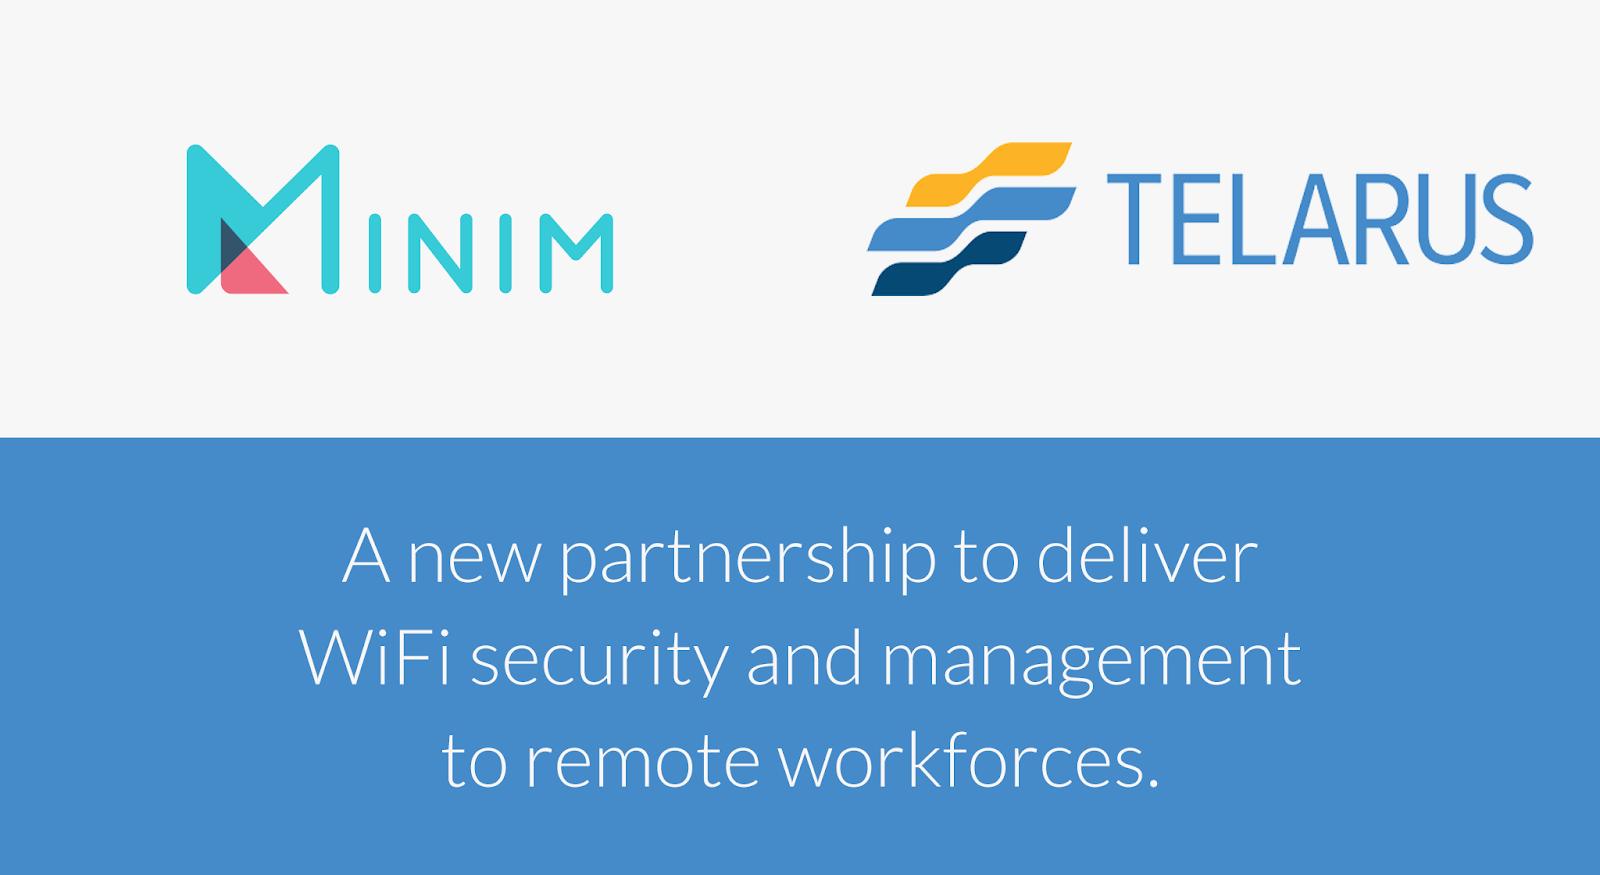 Minim and Telarus announce exclusive partnership